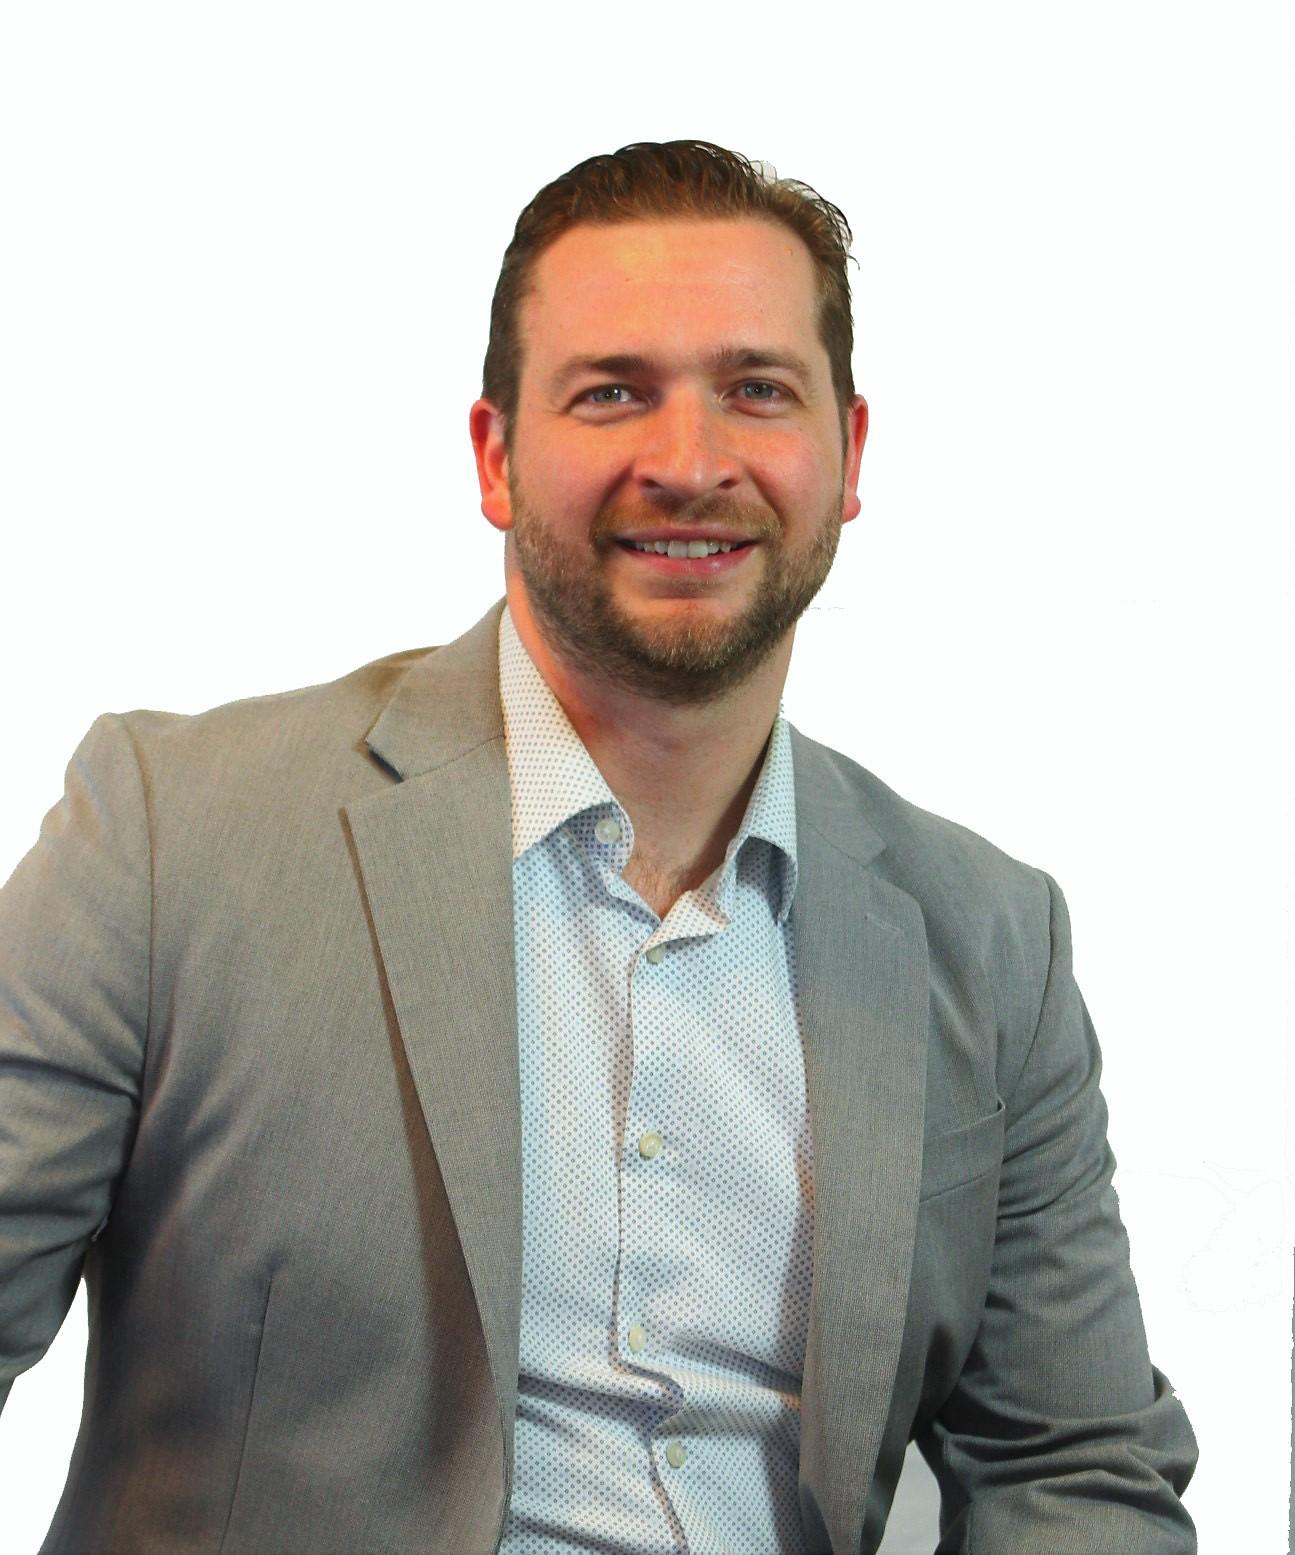 Jonathan Olson